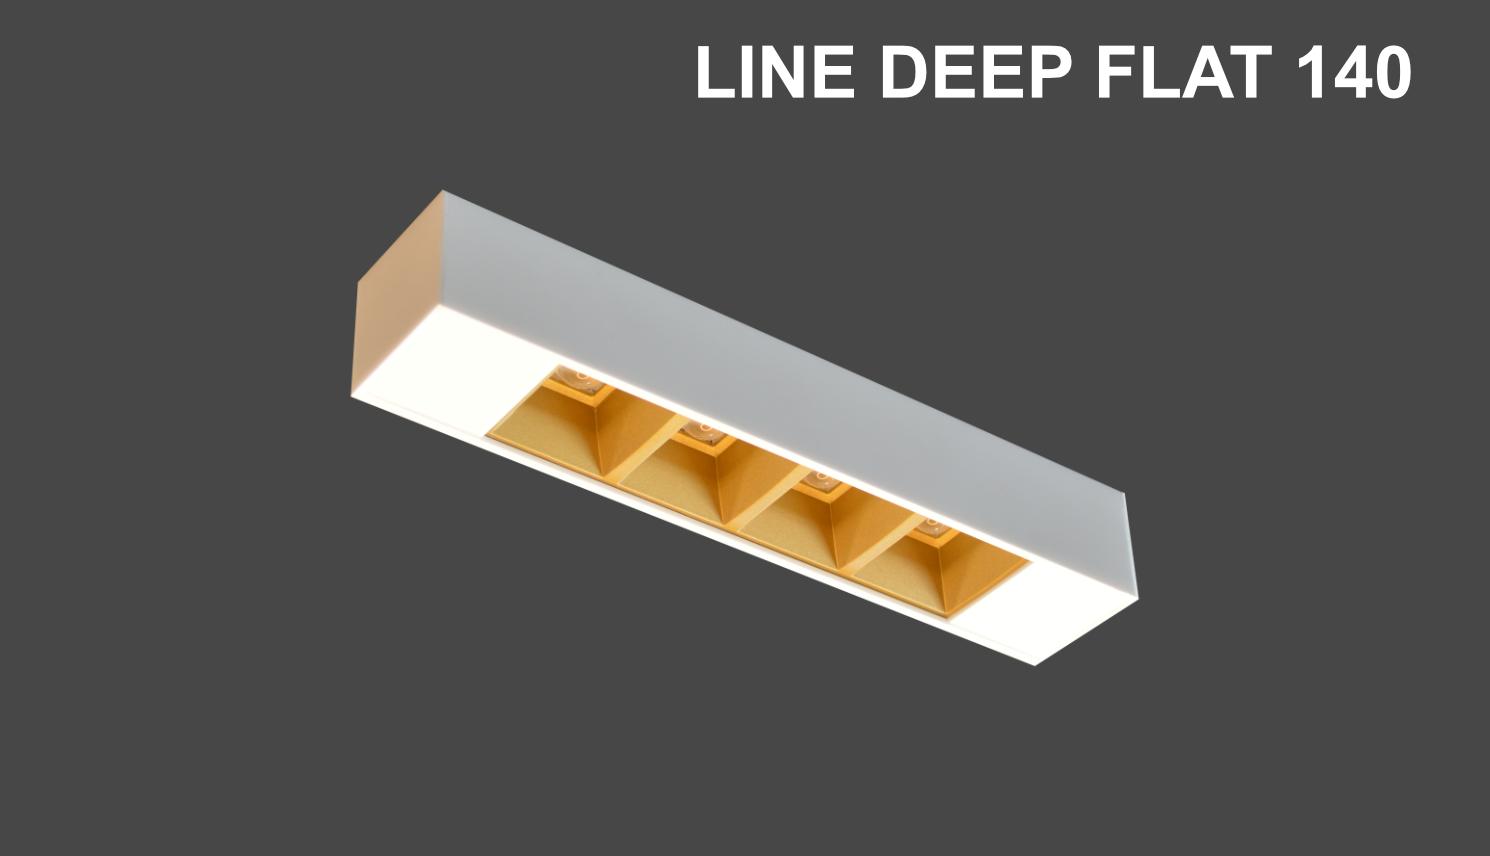 LINE DEEP FLAT 140